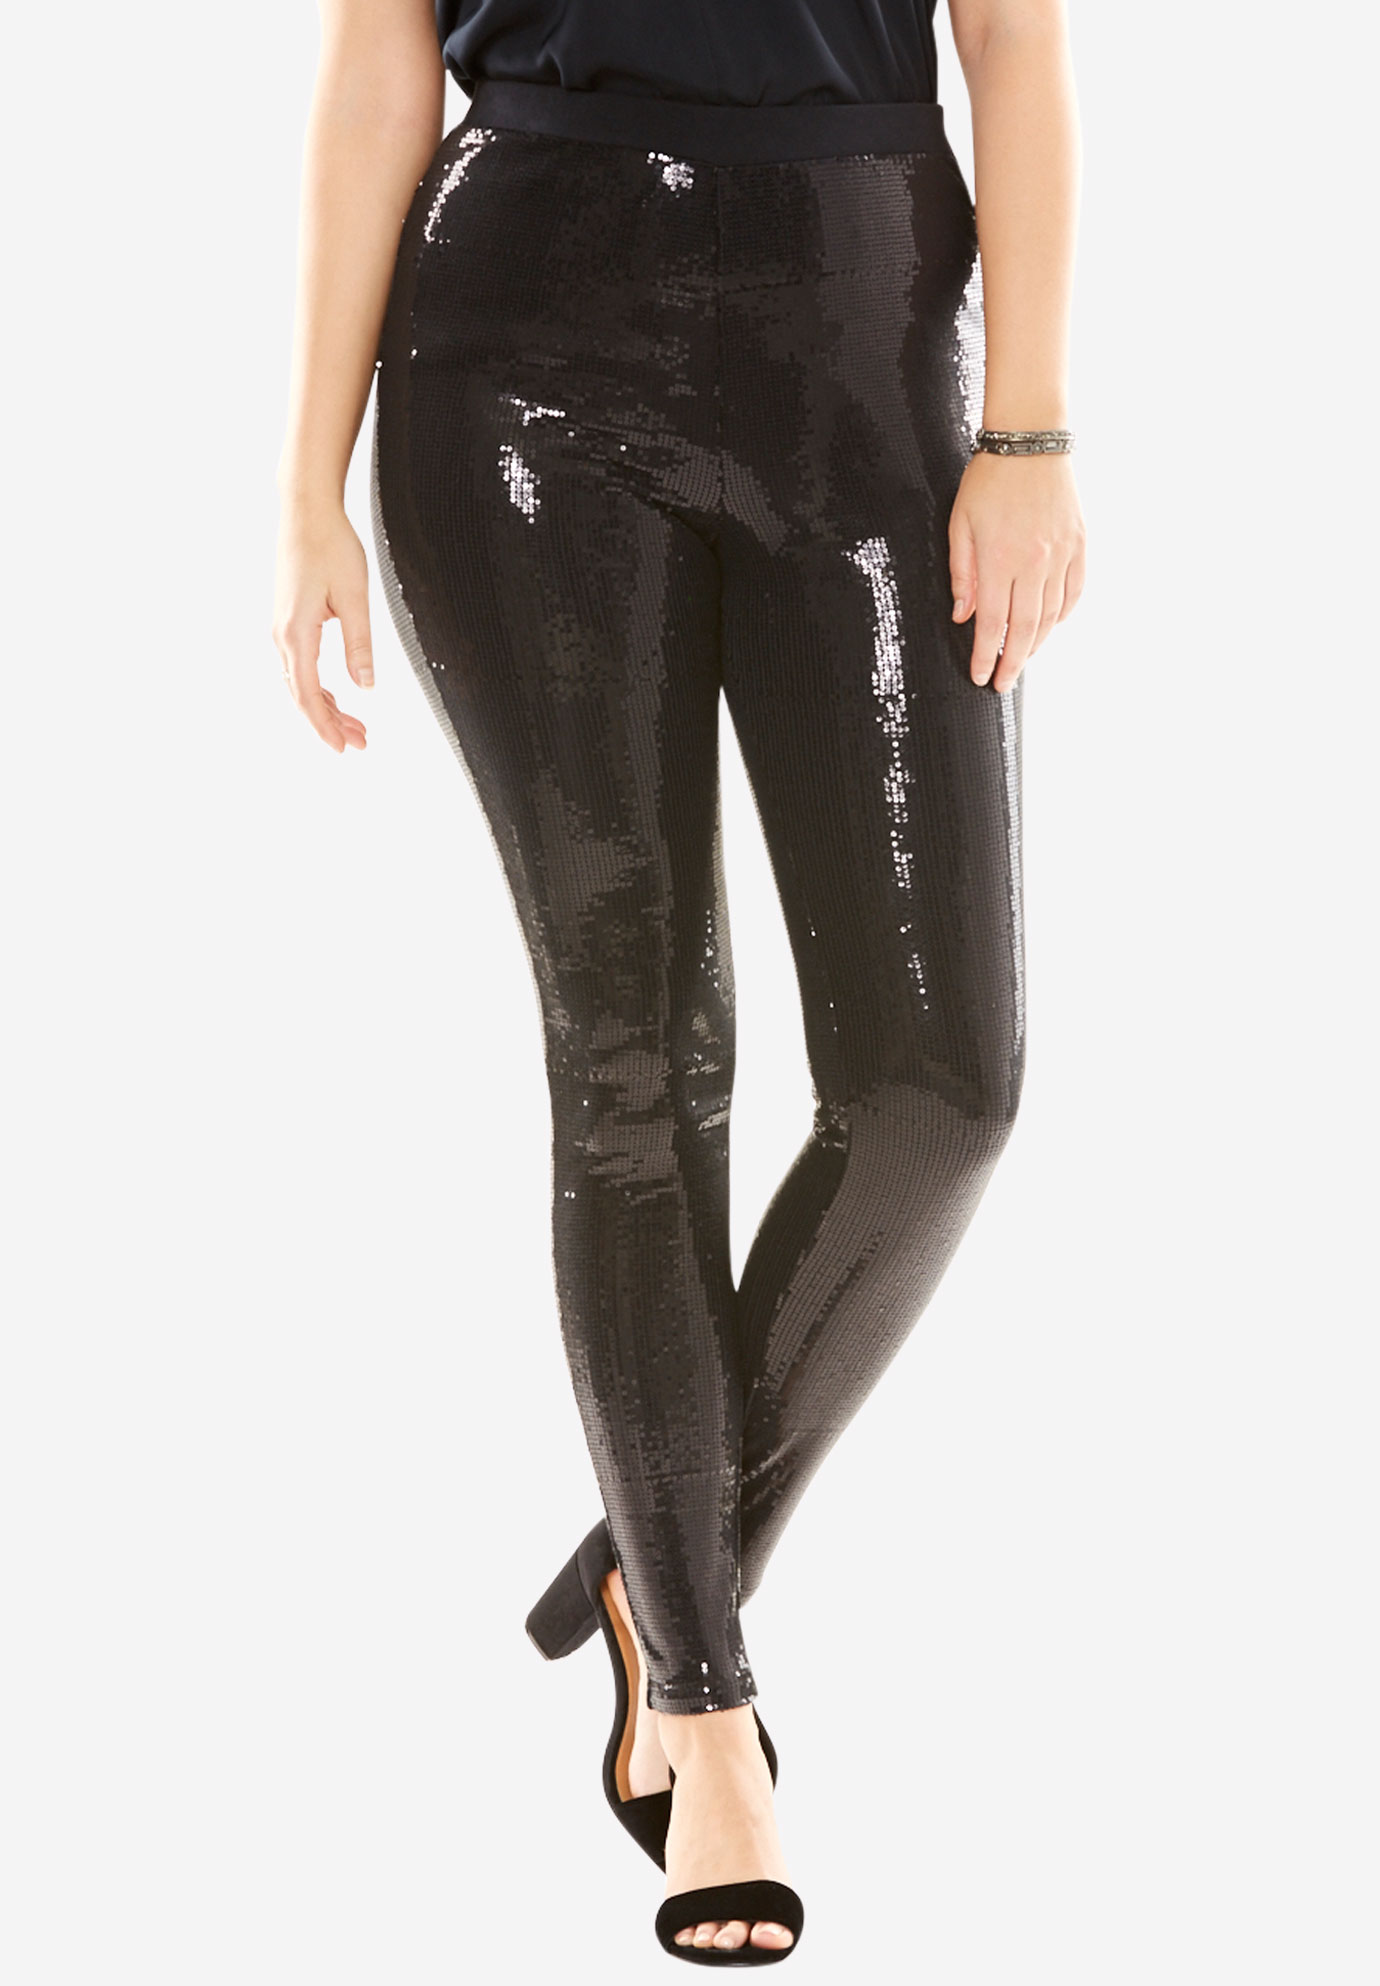 09bd0e1a6f7759 Sequin Leggings| Plus Size Pants | Full Beauty